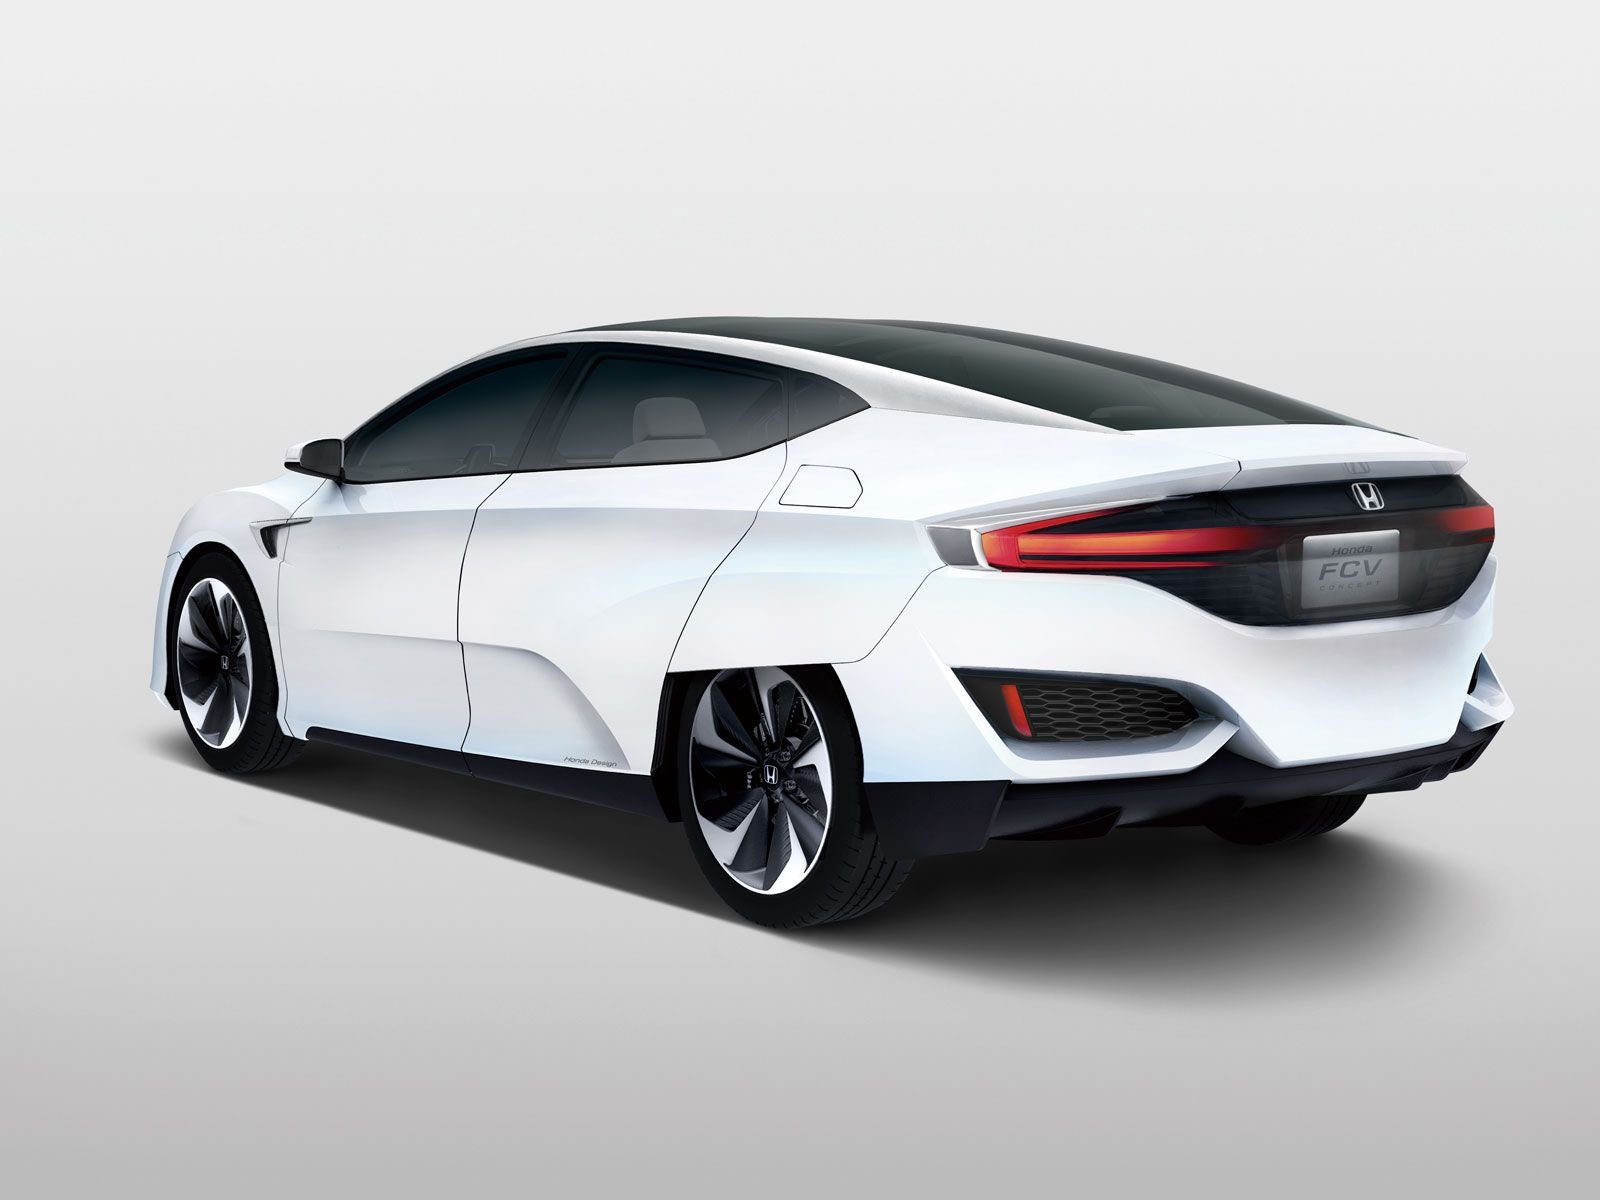 Honda Fcv Concept Automovil Conceptual Carros Electricos Coche